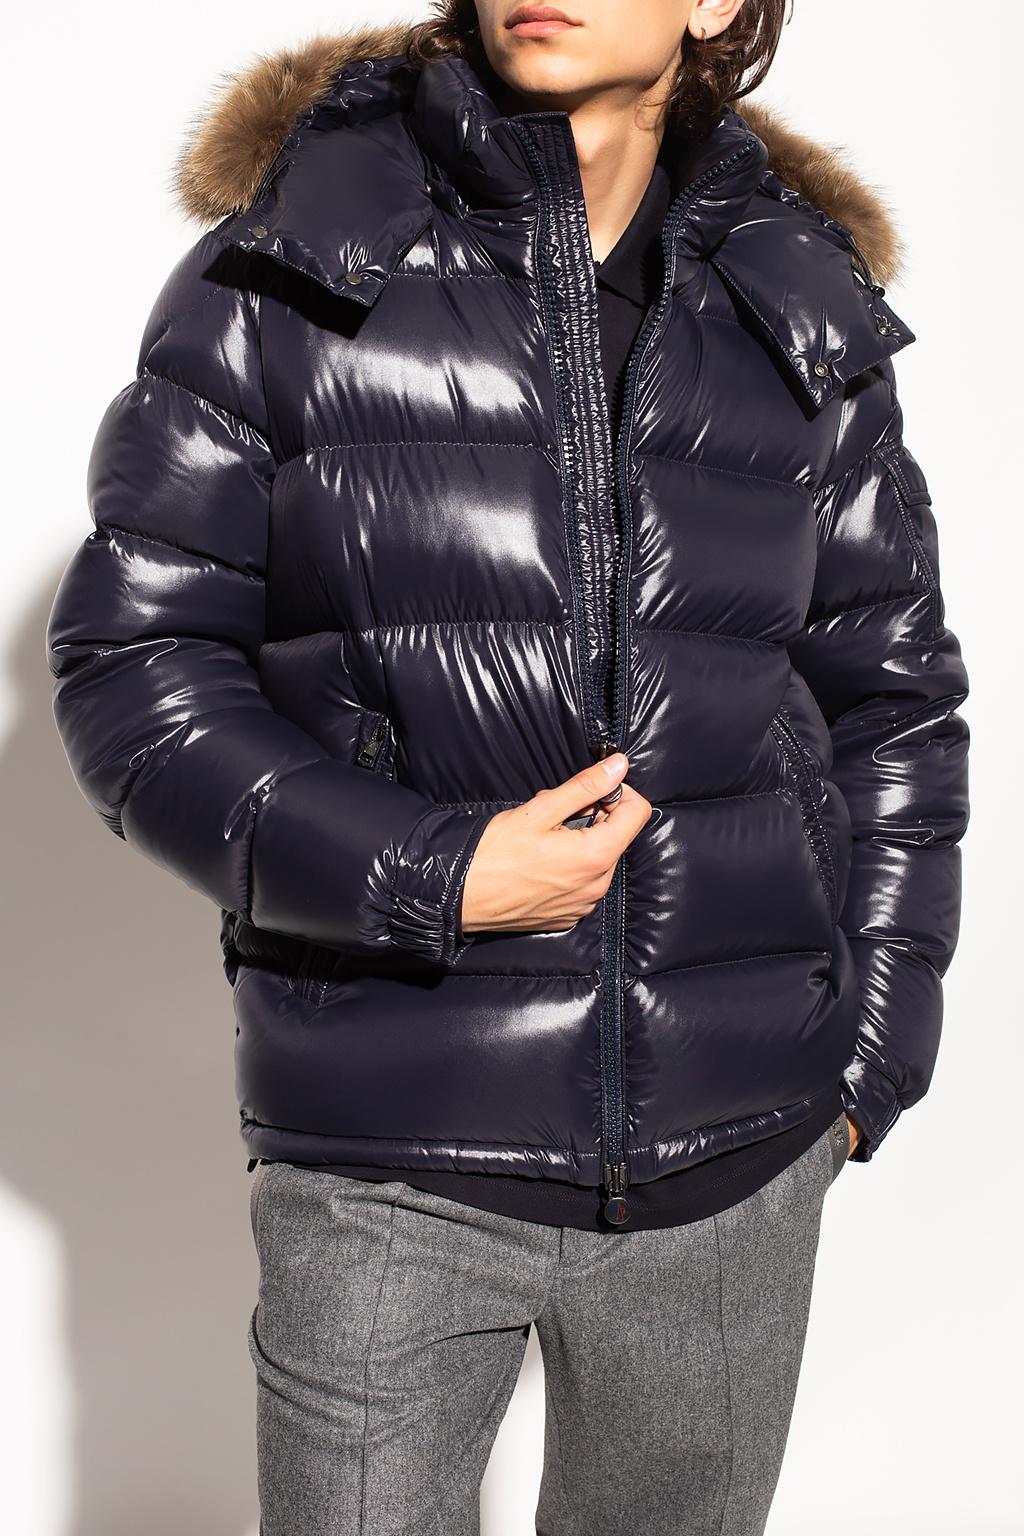 Moncler 'Maya' down jacket